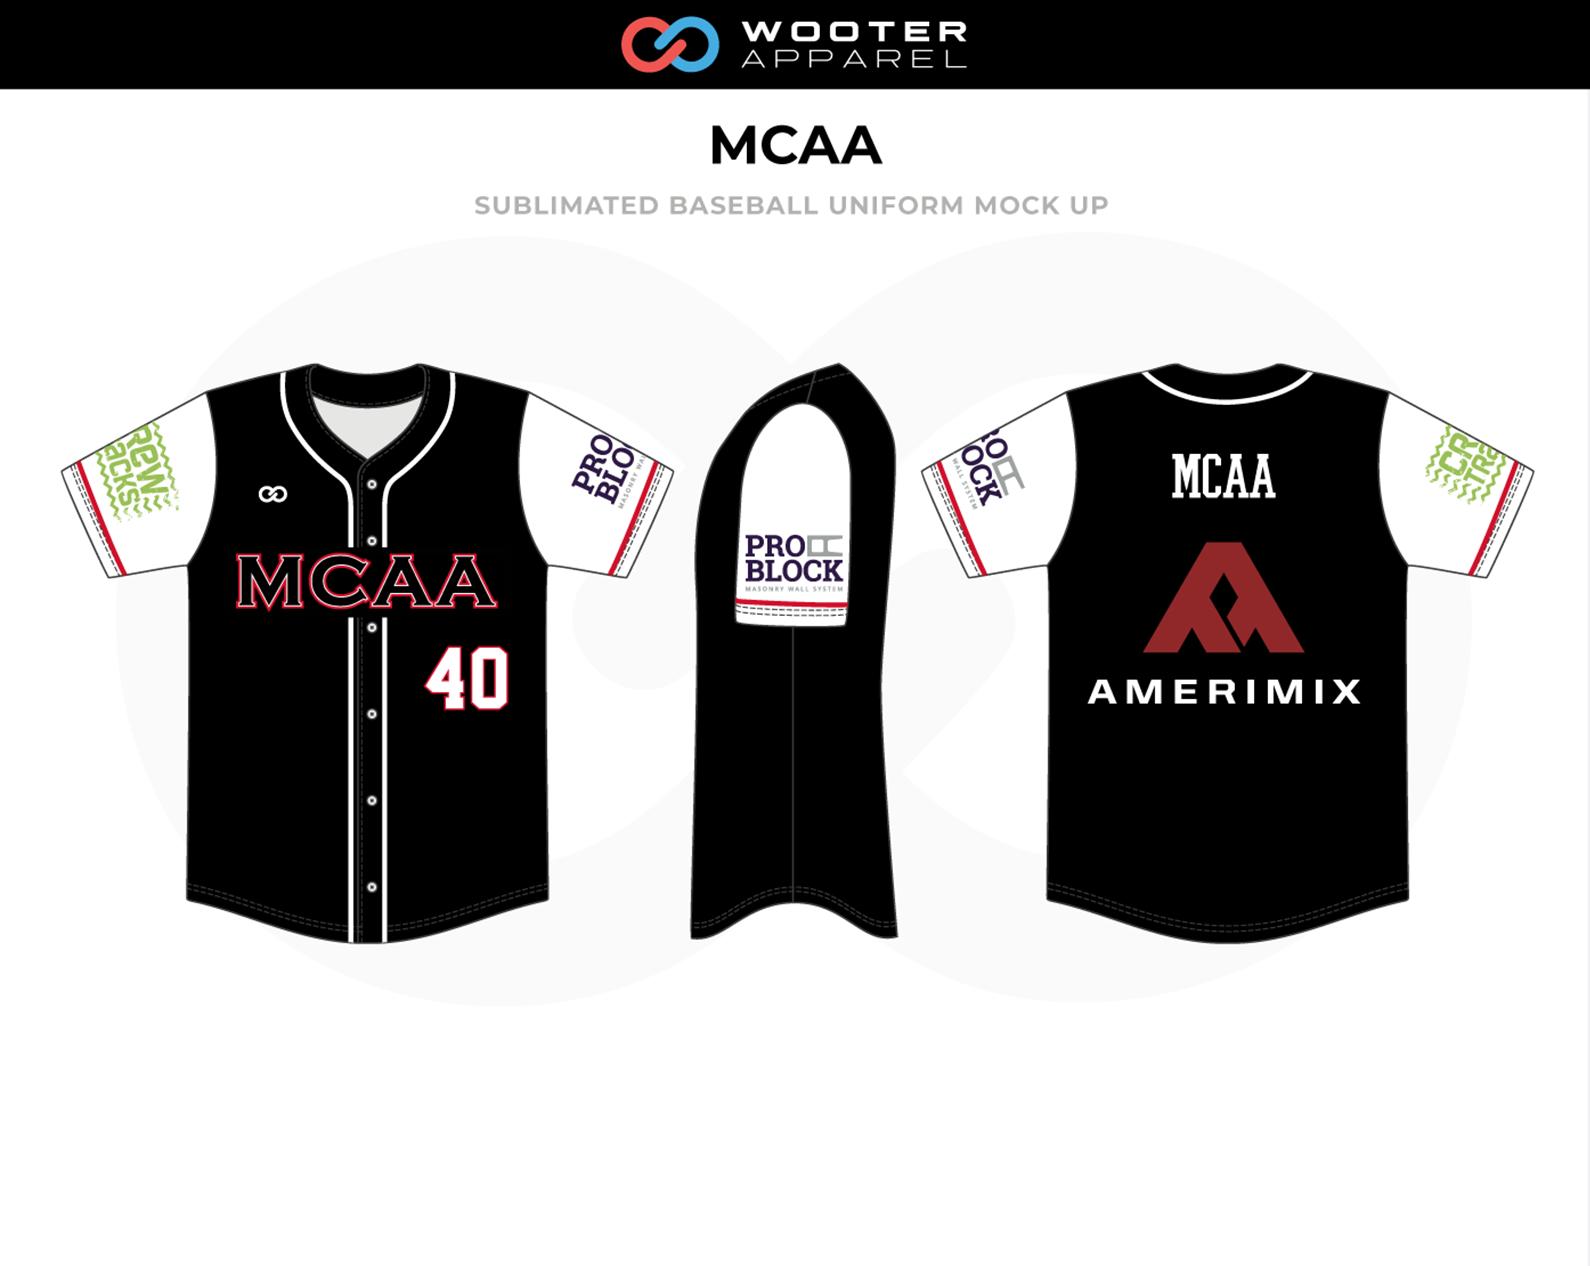 MCAA-Sublimated-Baseball-Uniform_v1_2018.png